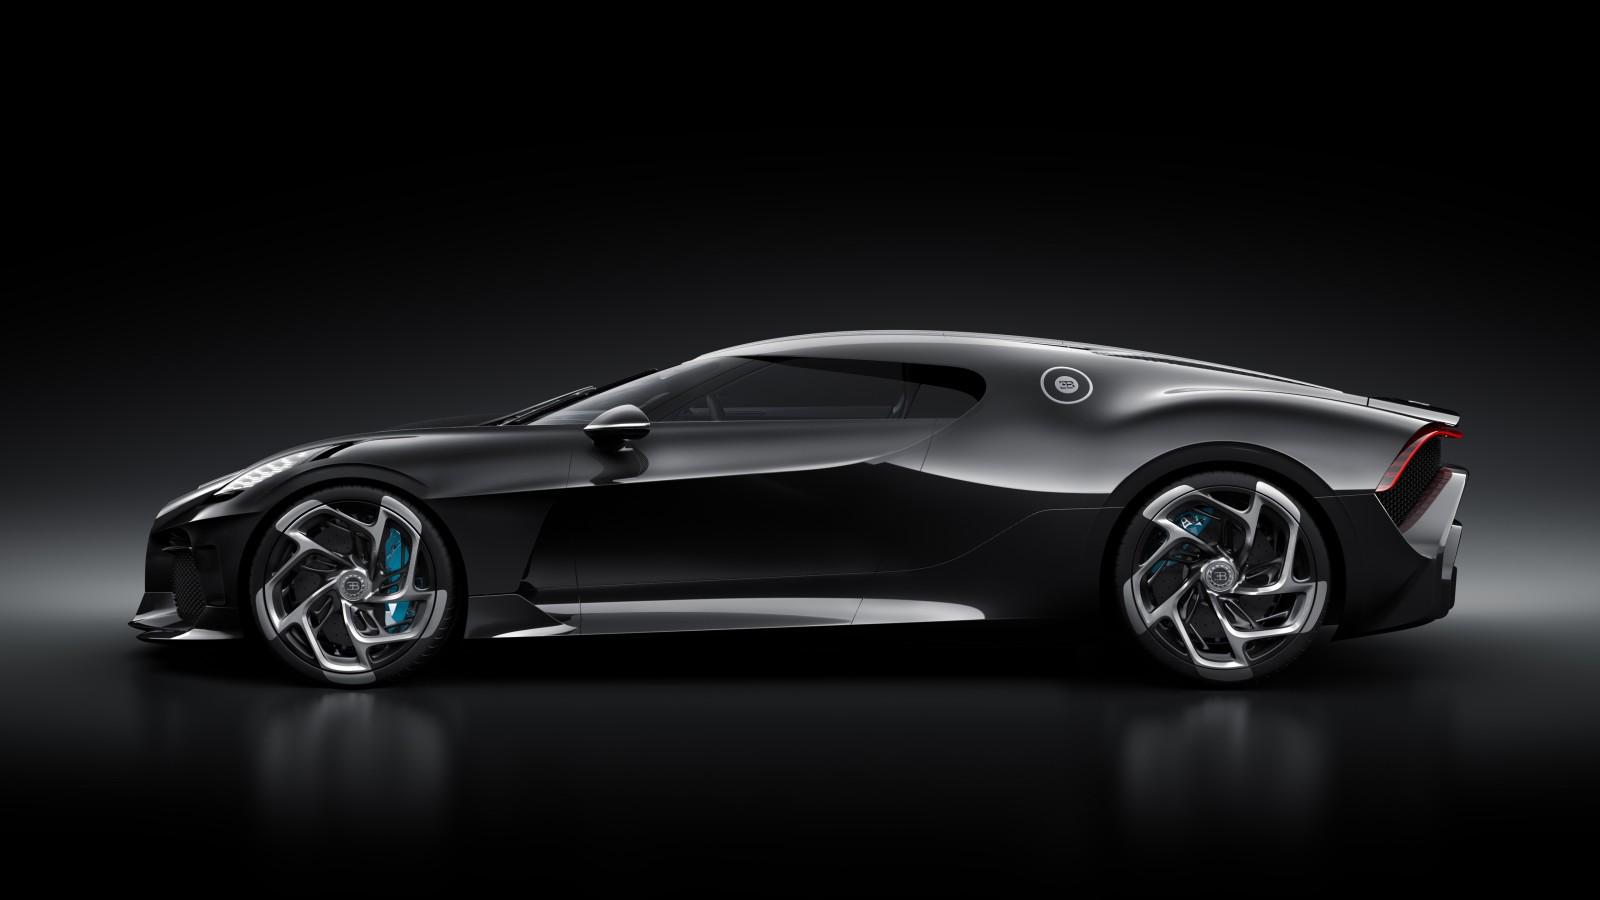 Lotus Sports Car >> Bugatti La Voiture Noire 2019 4K 2 Wallpaper | HD Car ...